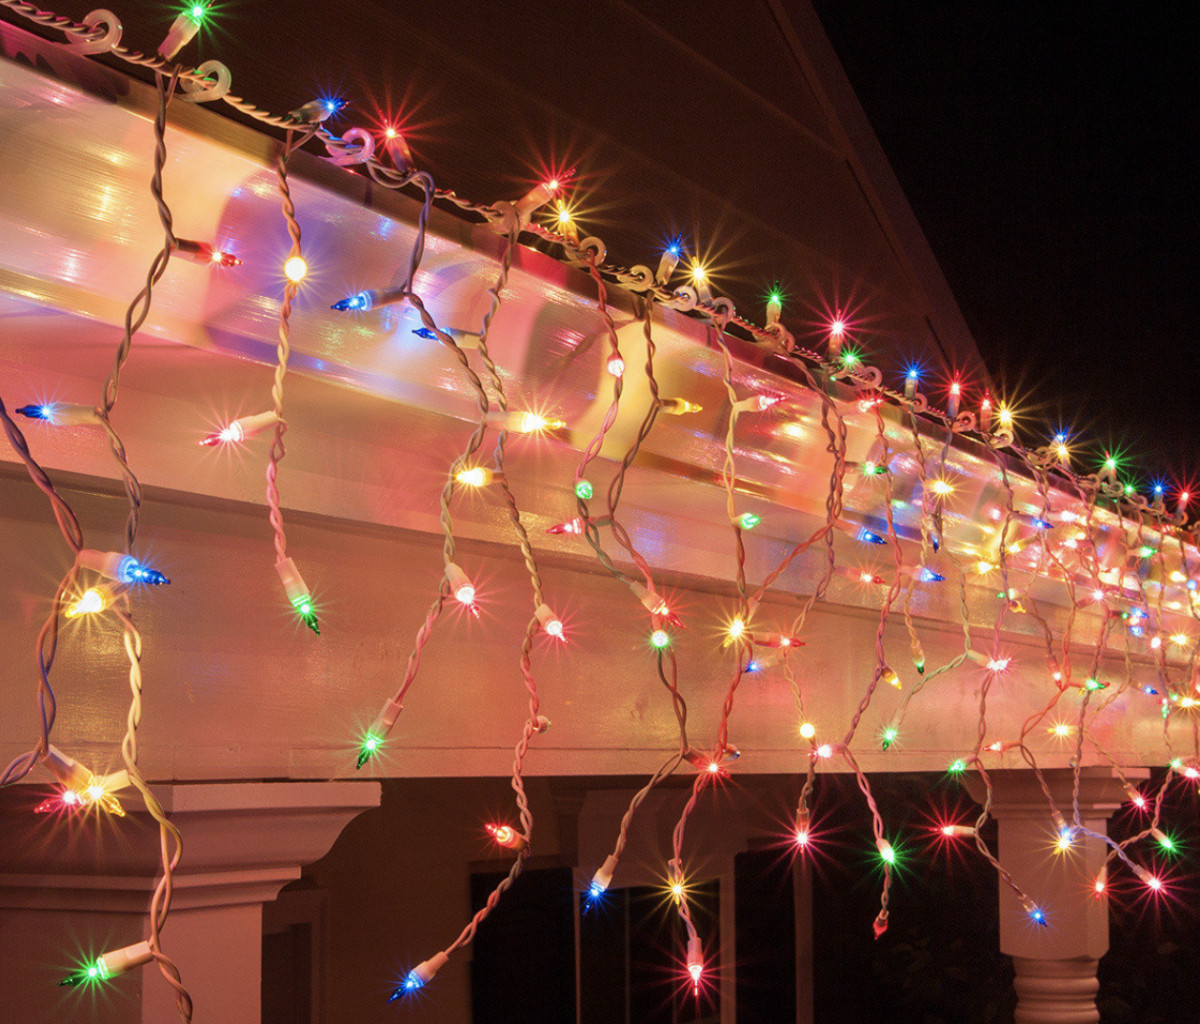 Уличная Гирлянда Бахрома 3,3 х 0,7 м 120 LED Цвета в Ассортименте sale